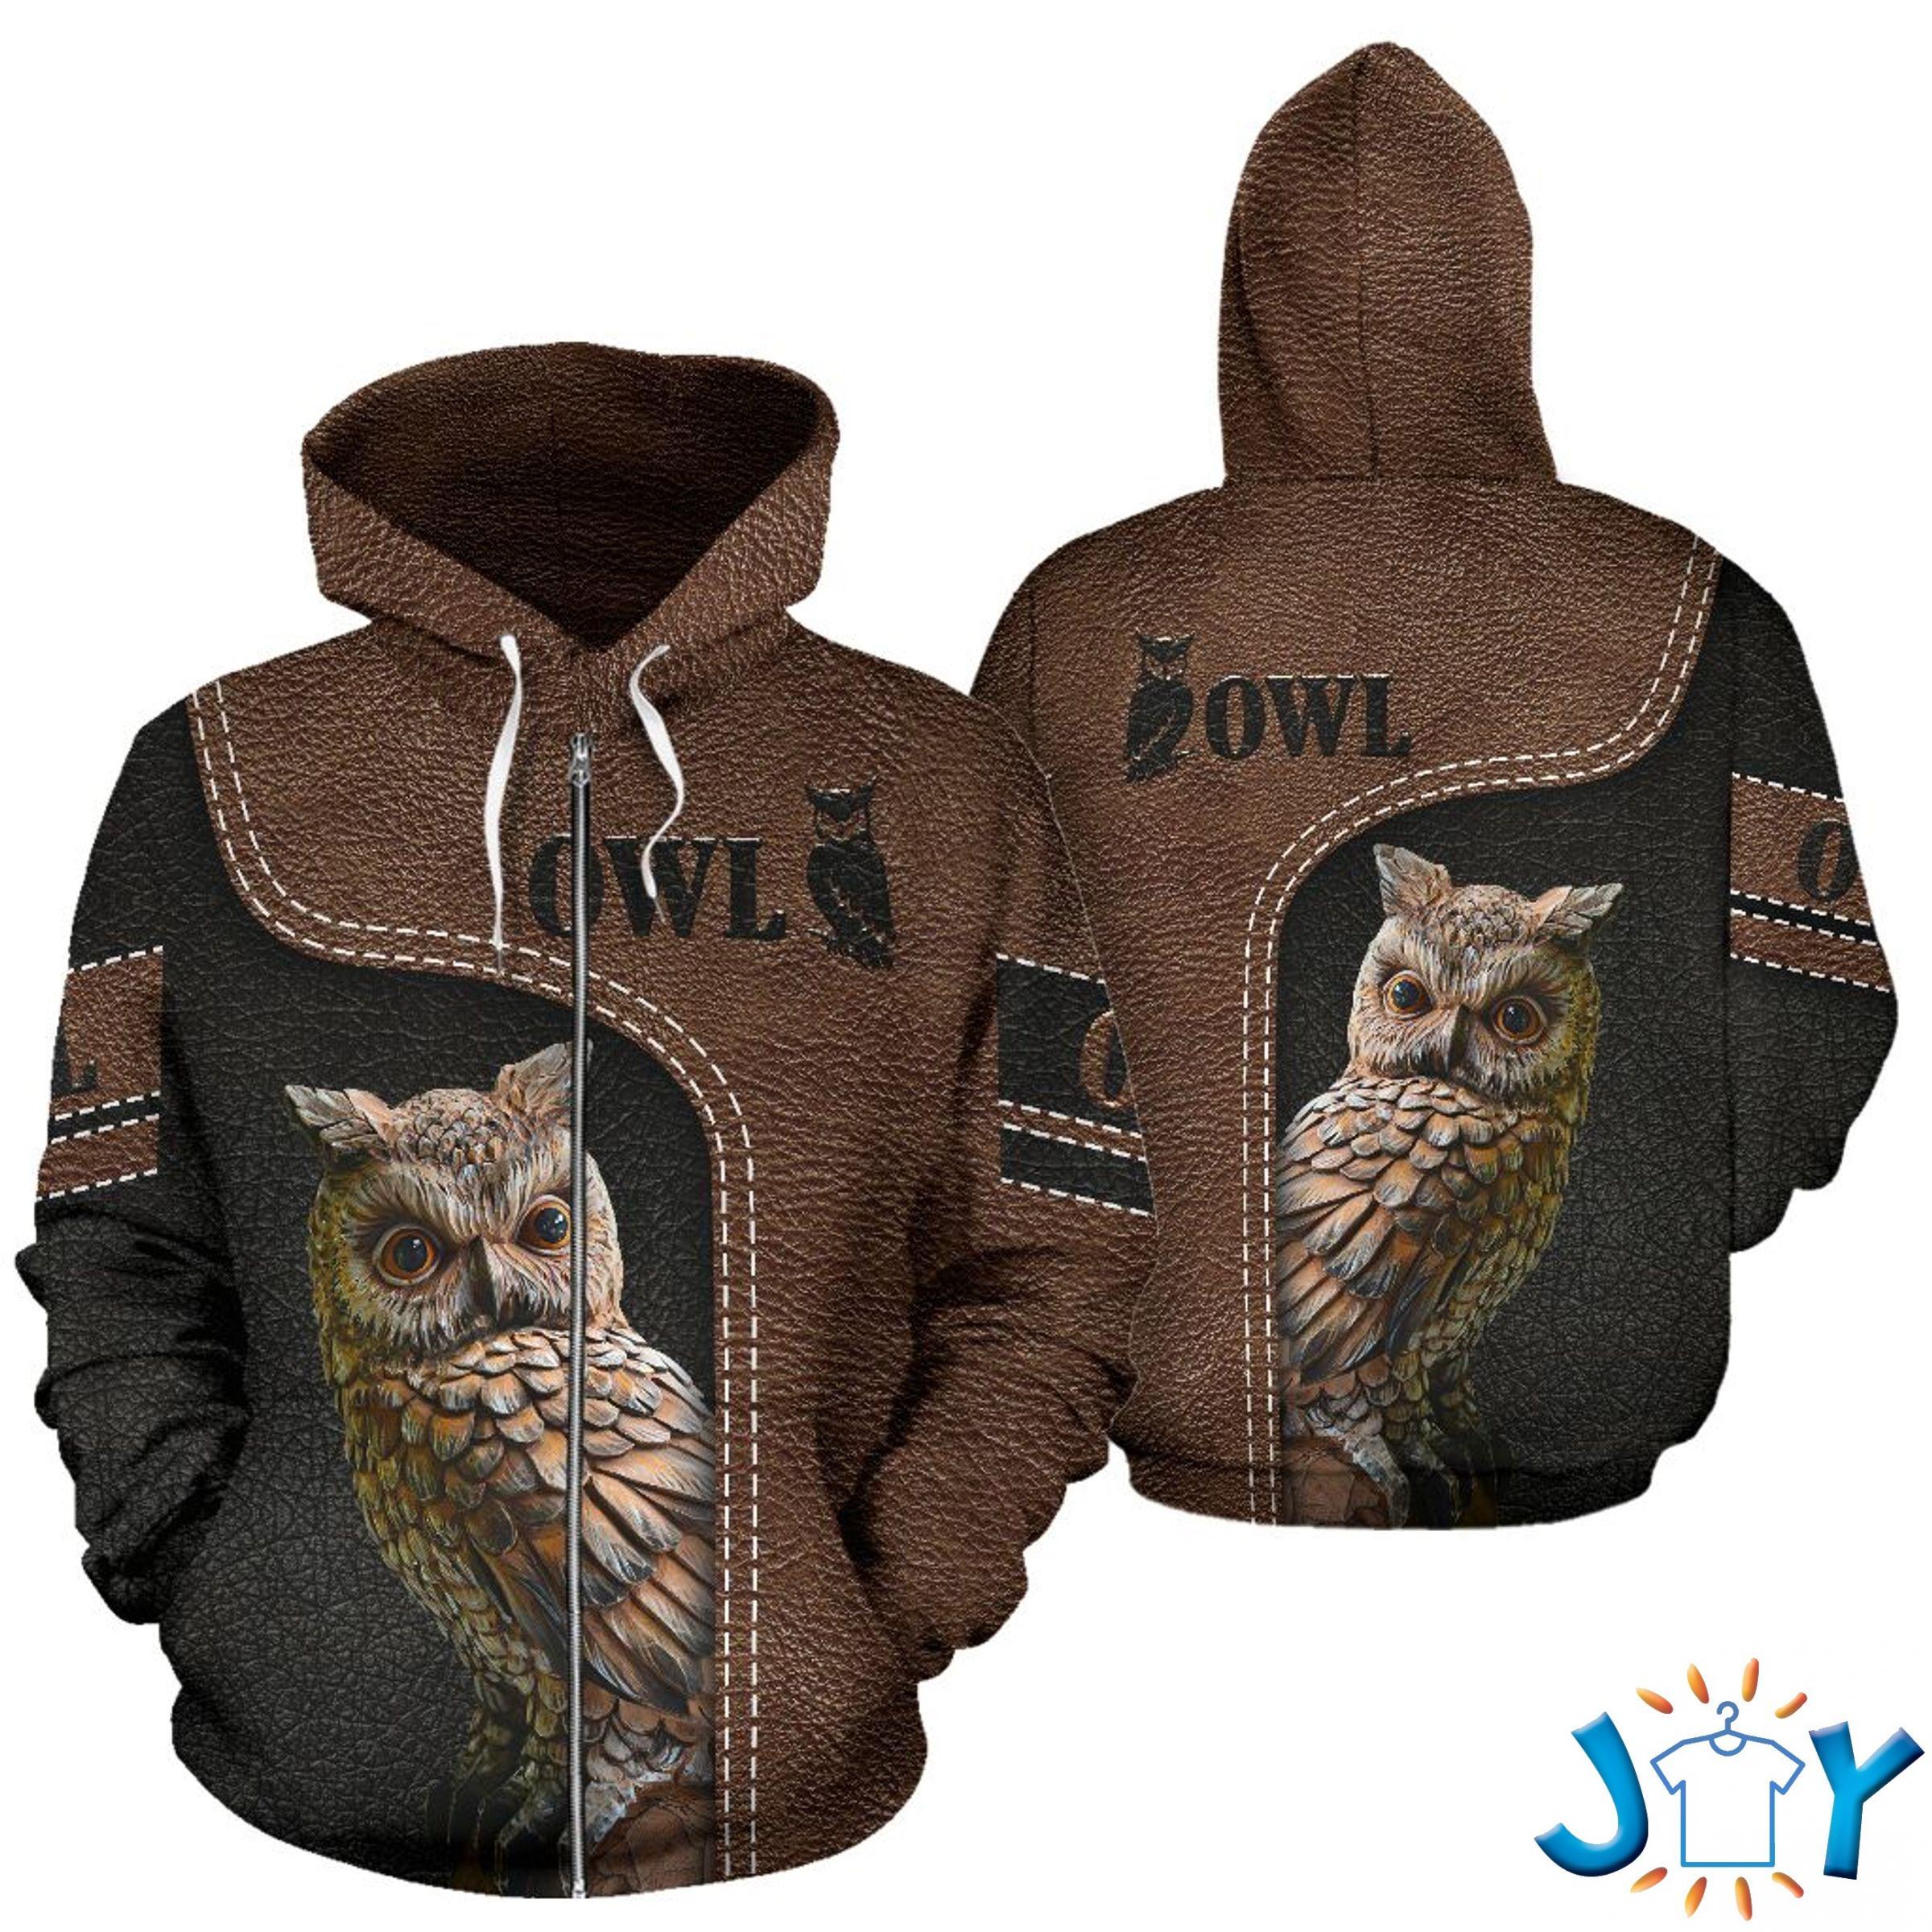 Owl Leather 3D Hoodies